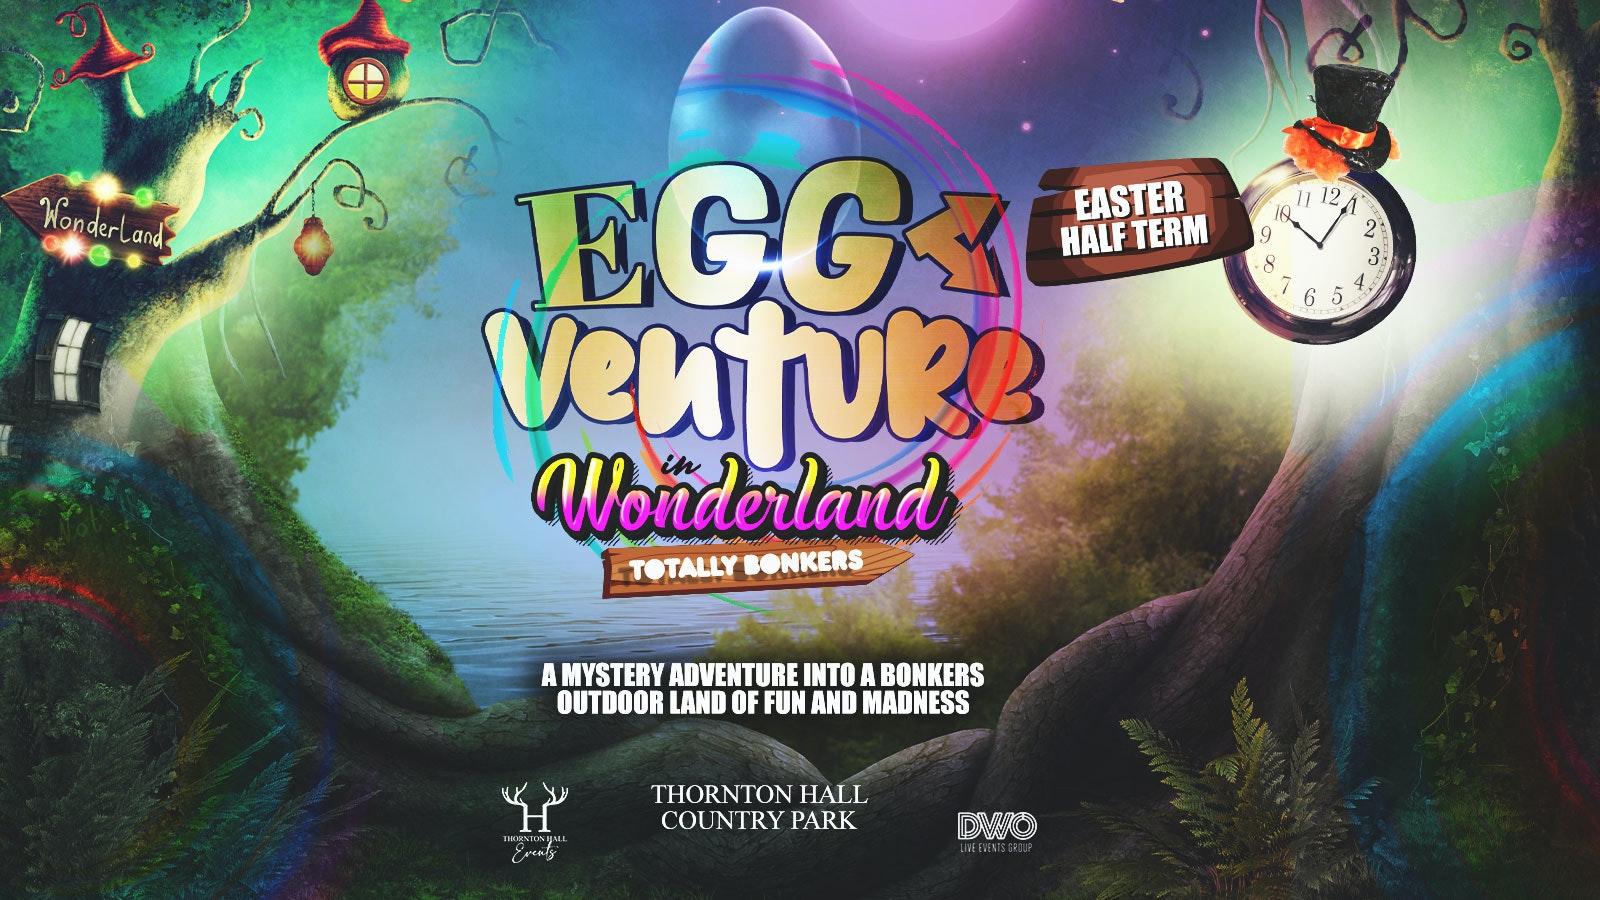 EggVenture in Wonderland – Tuesday 30th March – 12noon